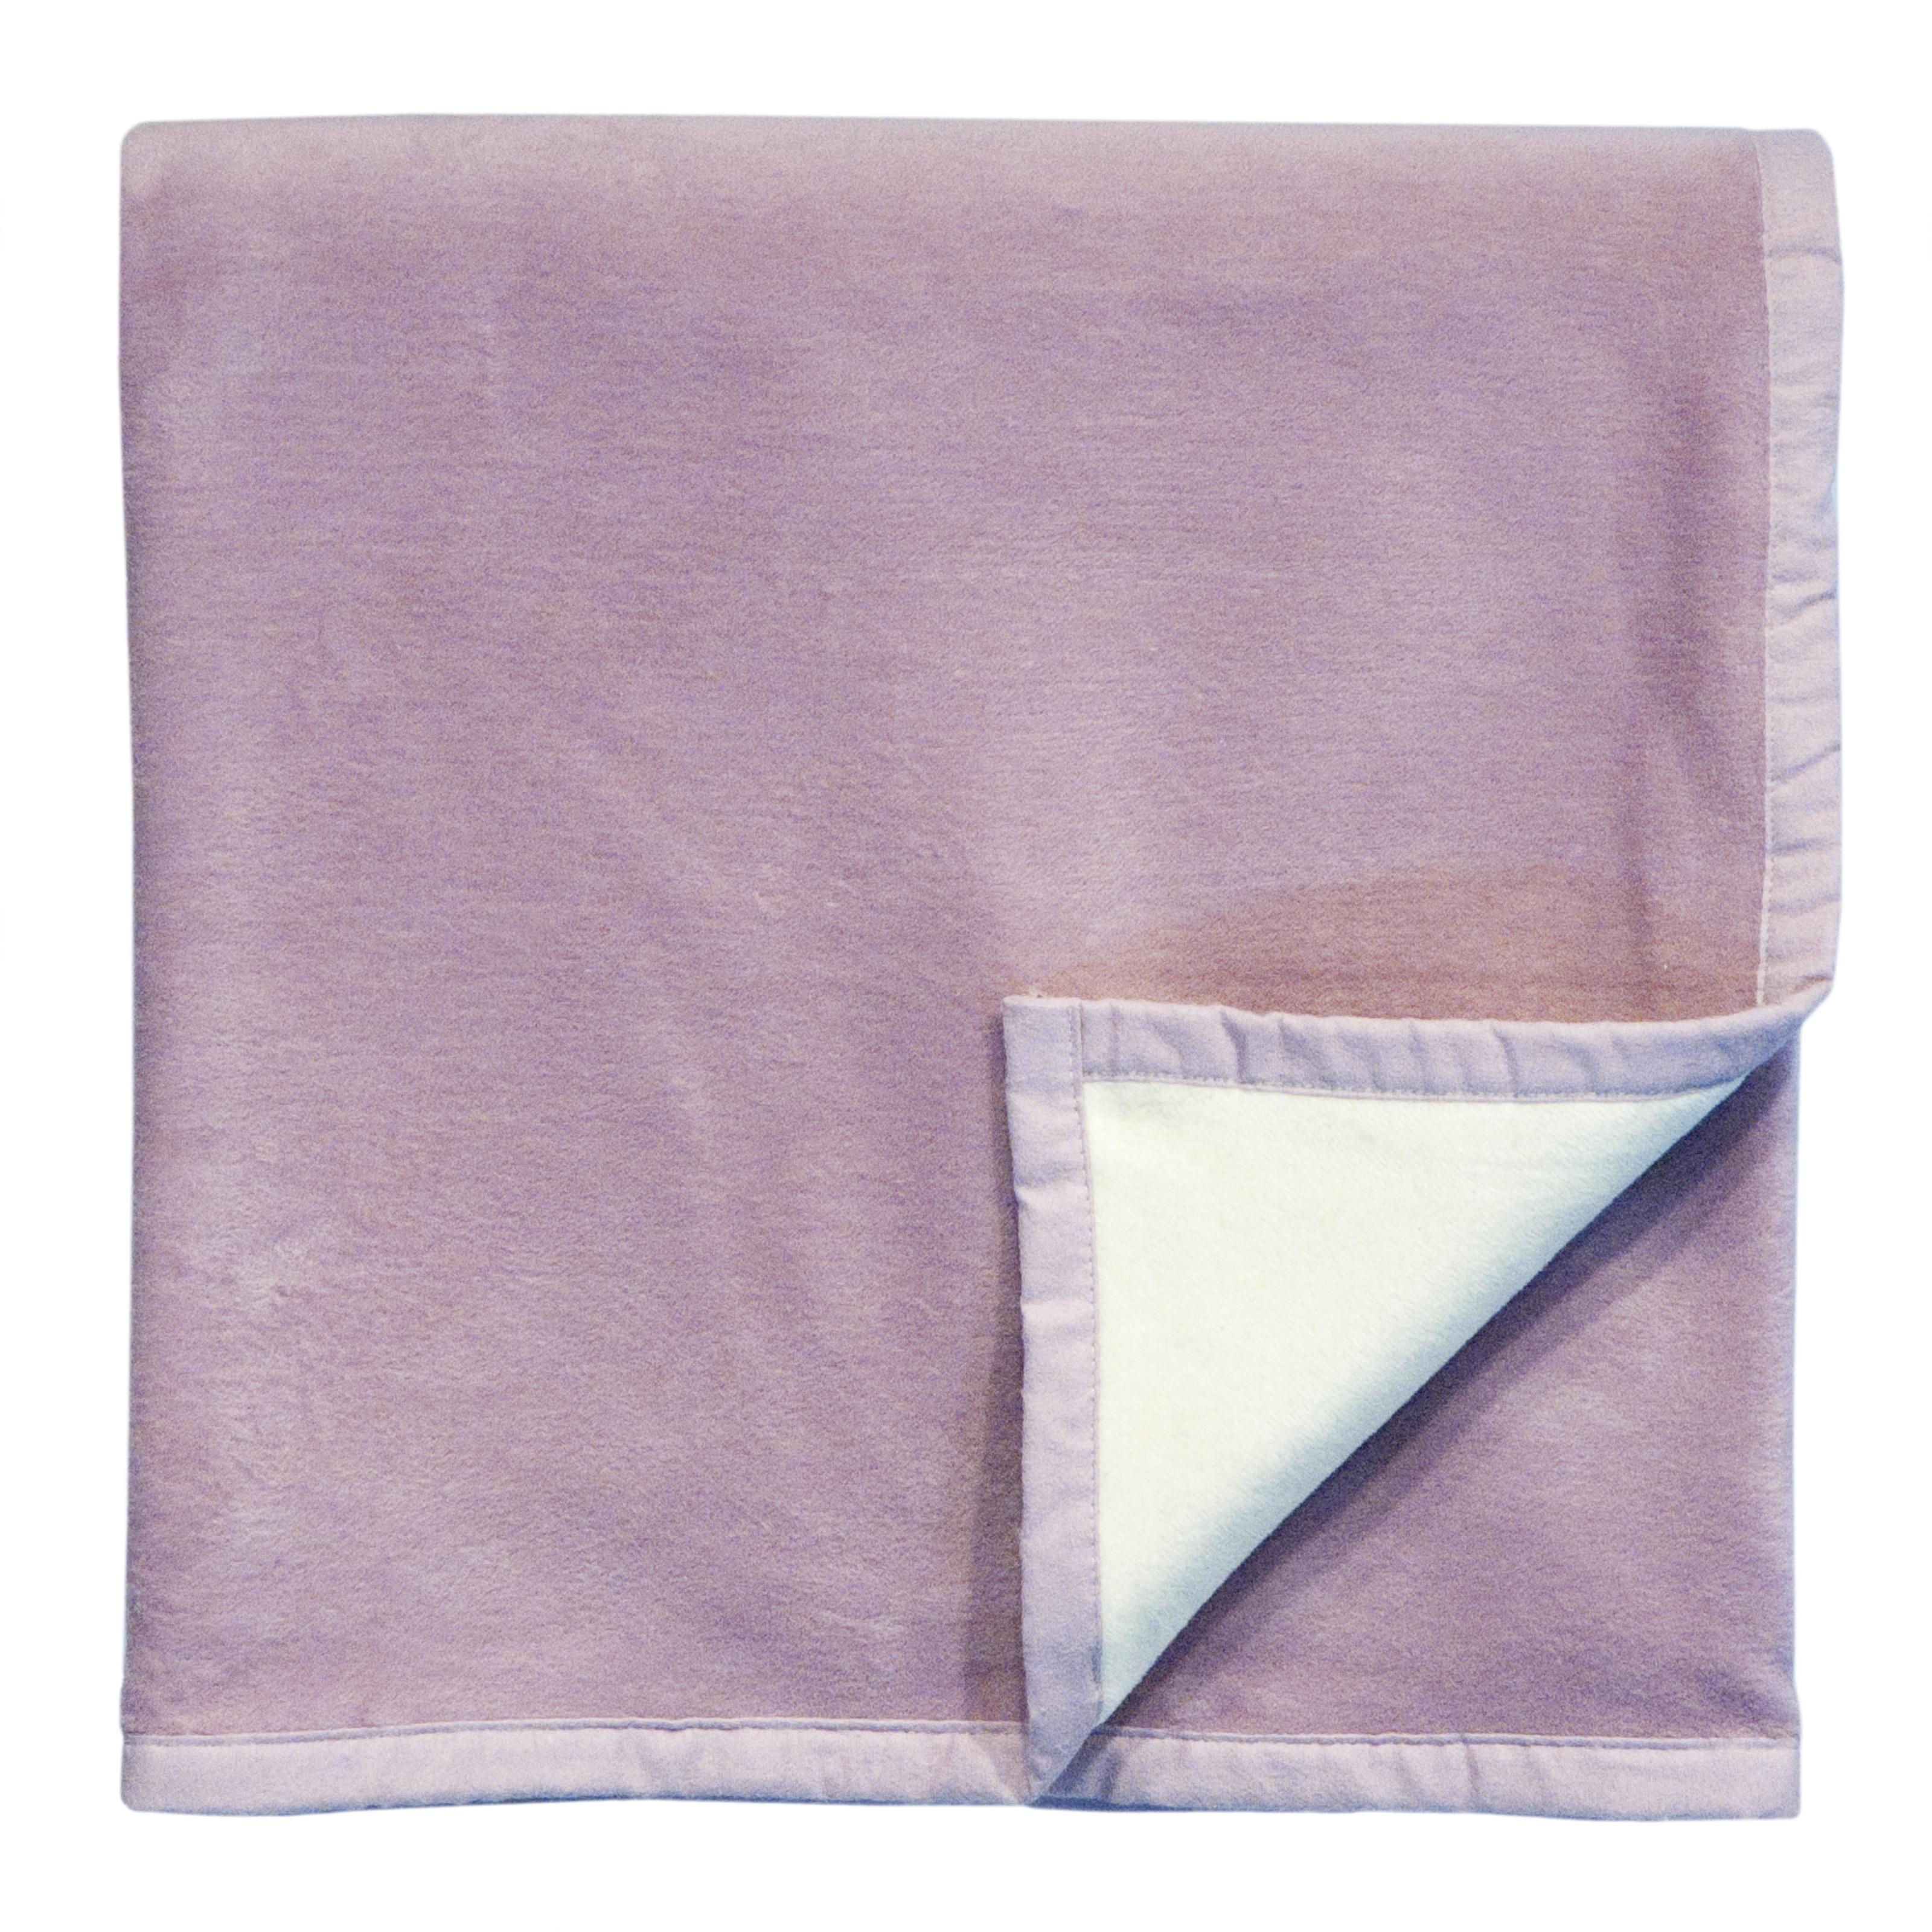 Bocasa Erika Woven Organic Cotton Throw Blanket